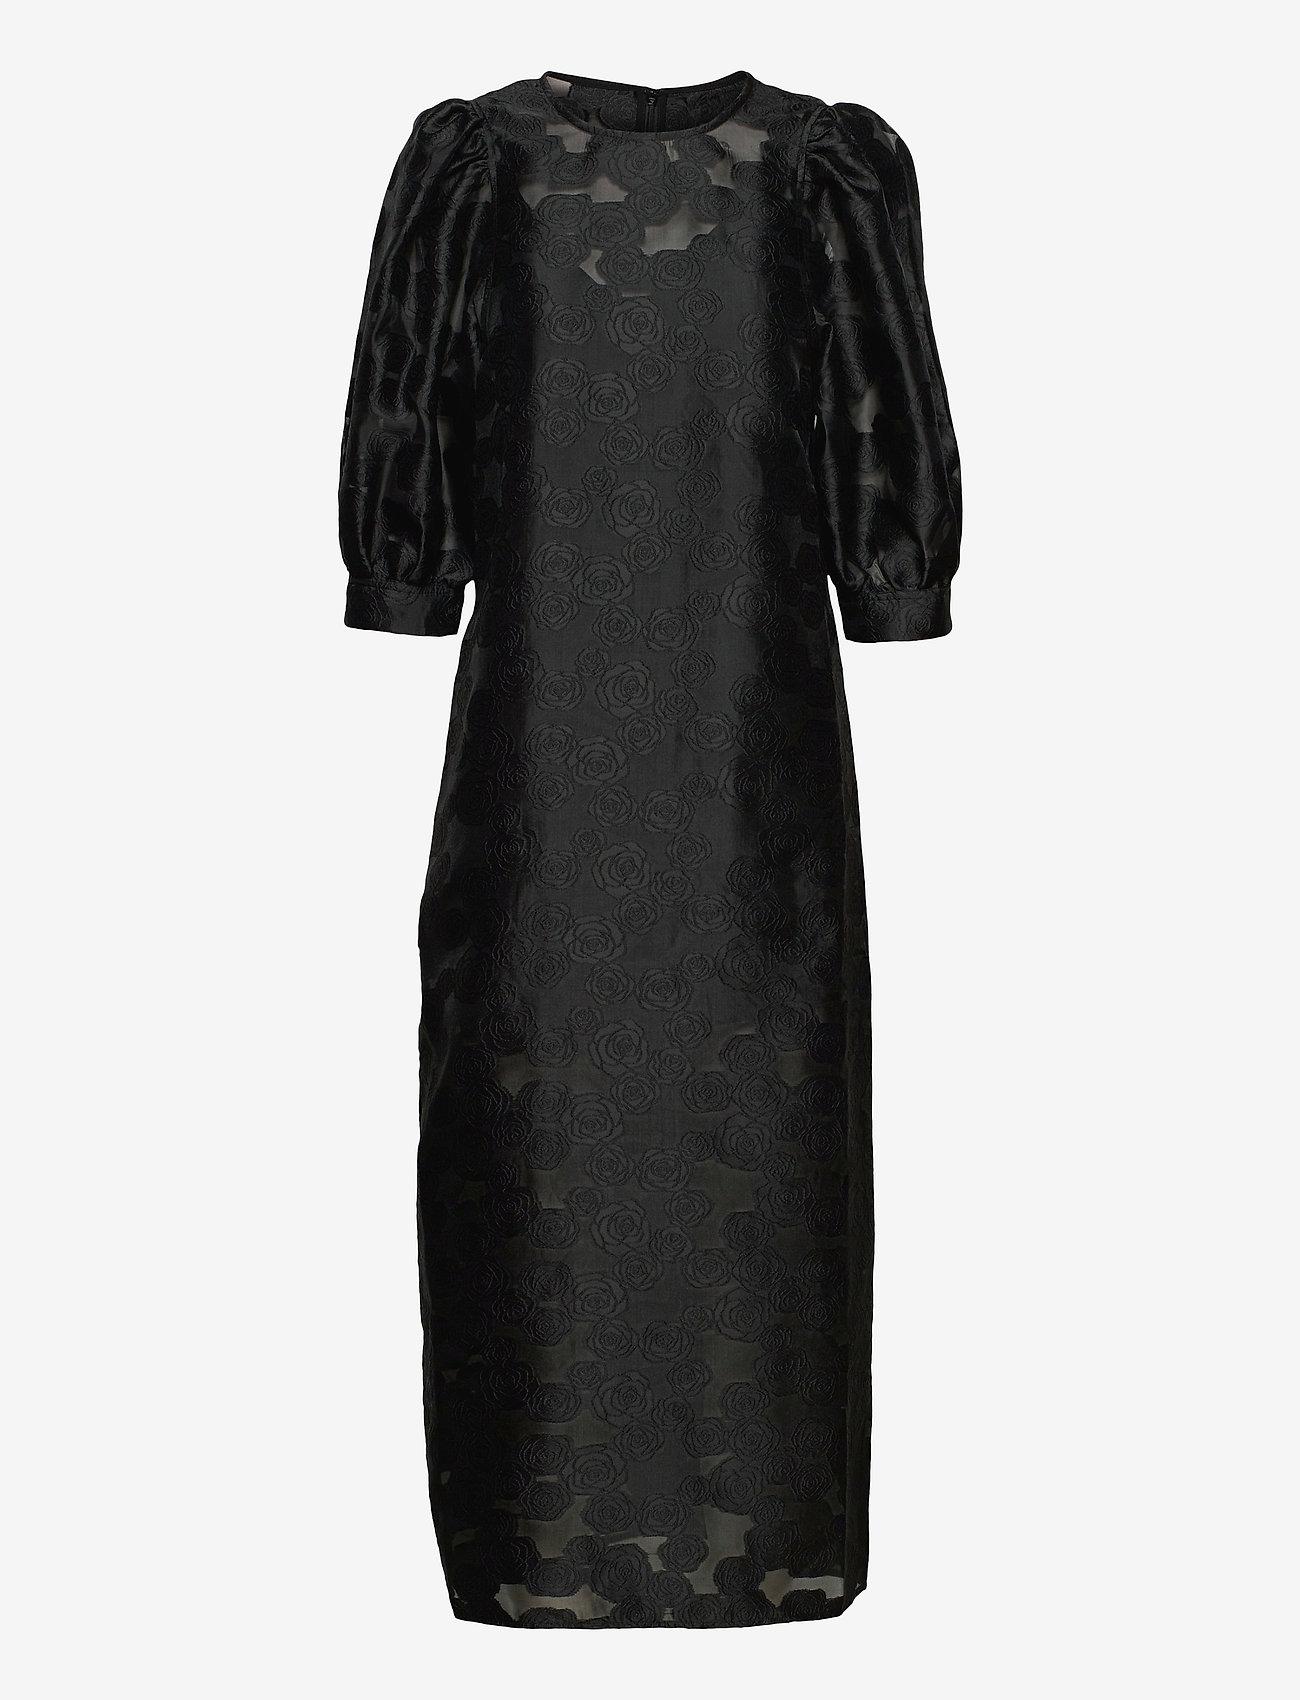 Samsøe Samsøe - Celestina long dress 12939 - kveldskjoler - black - 0